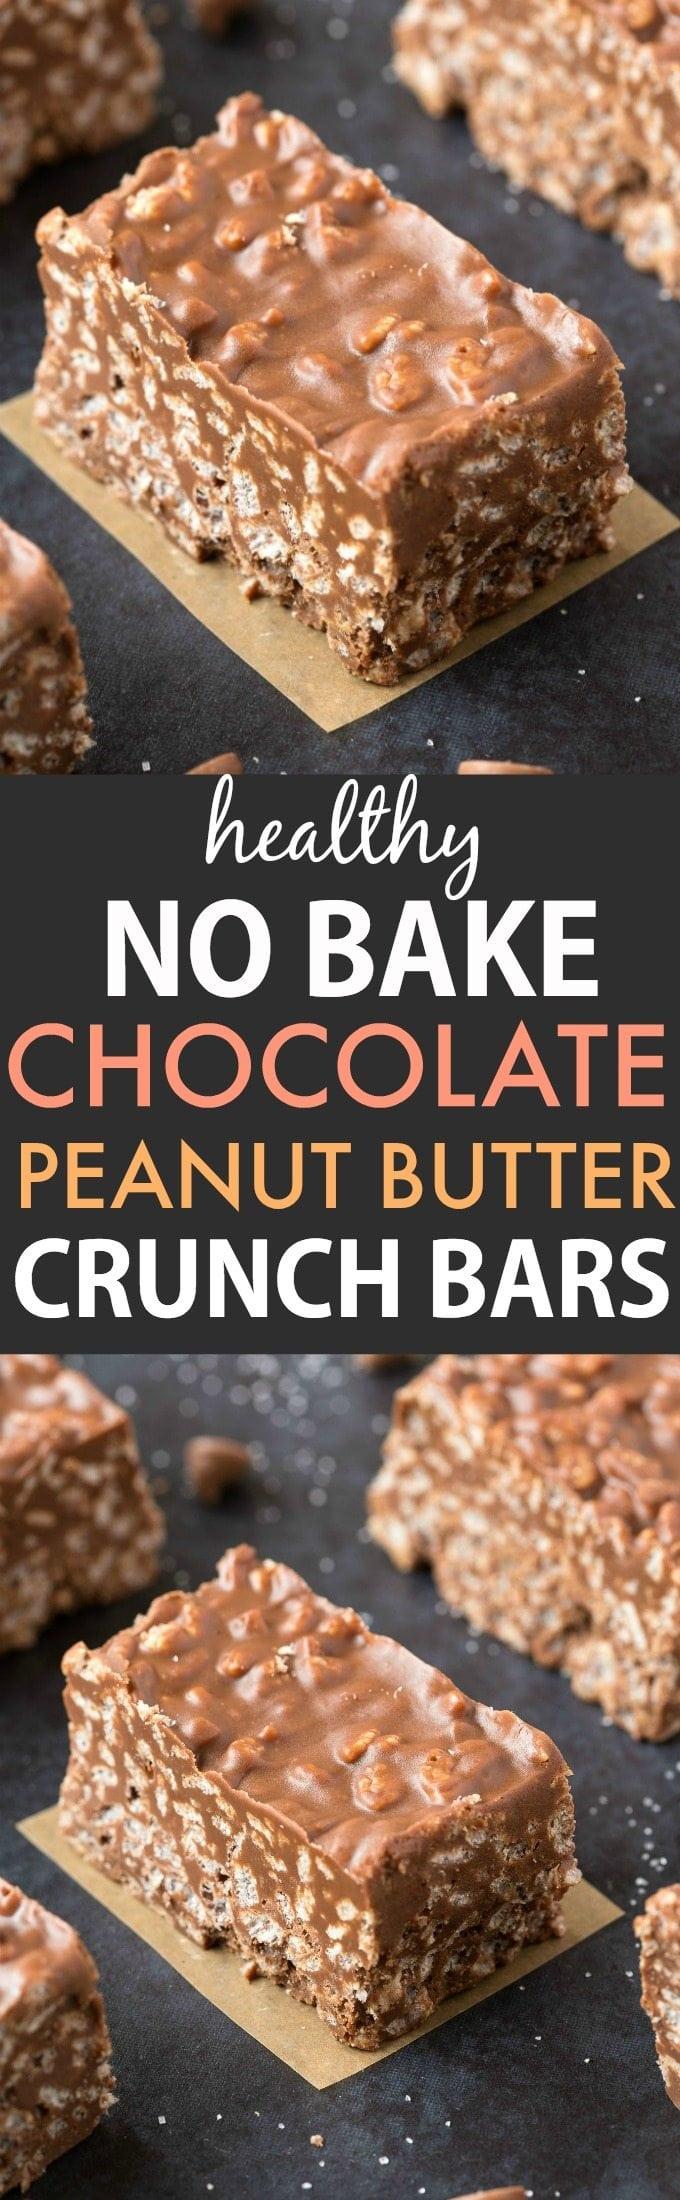 Healthy No Bake Chocolate Peanut Butter Crunch Bars (Vegan ...